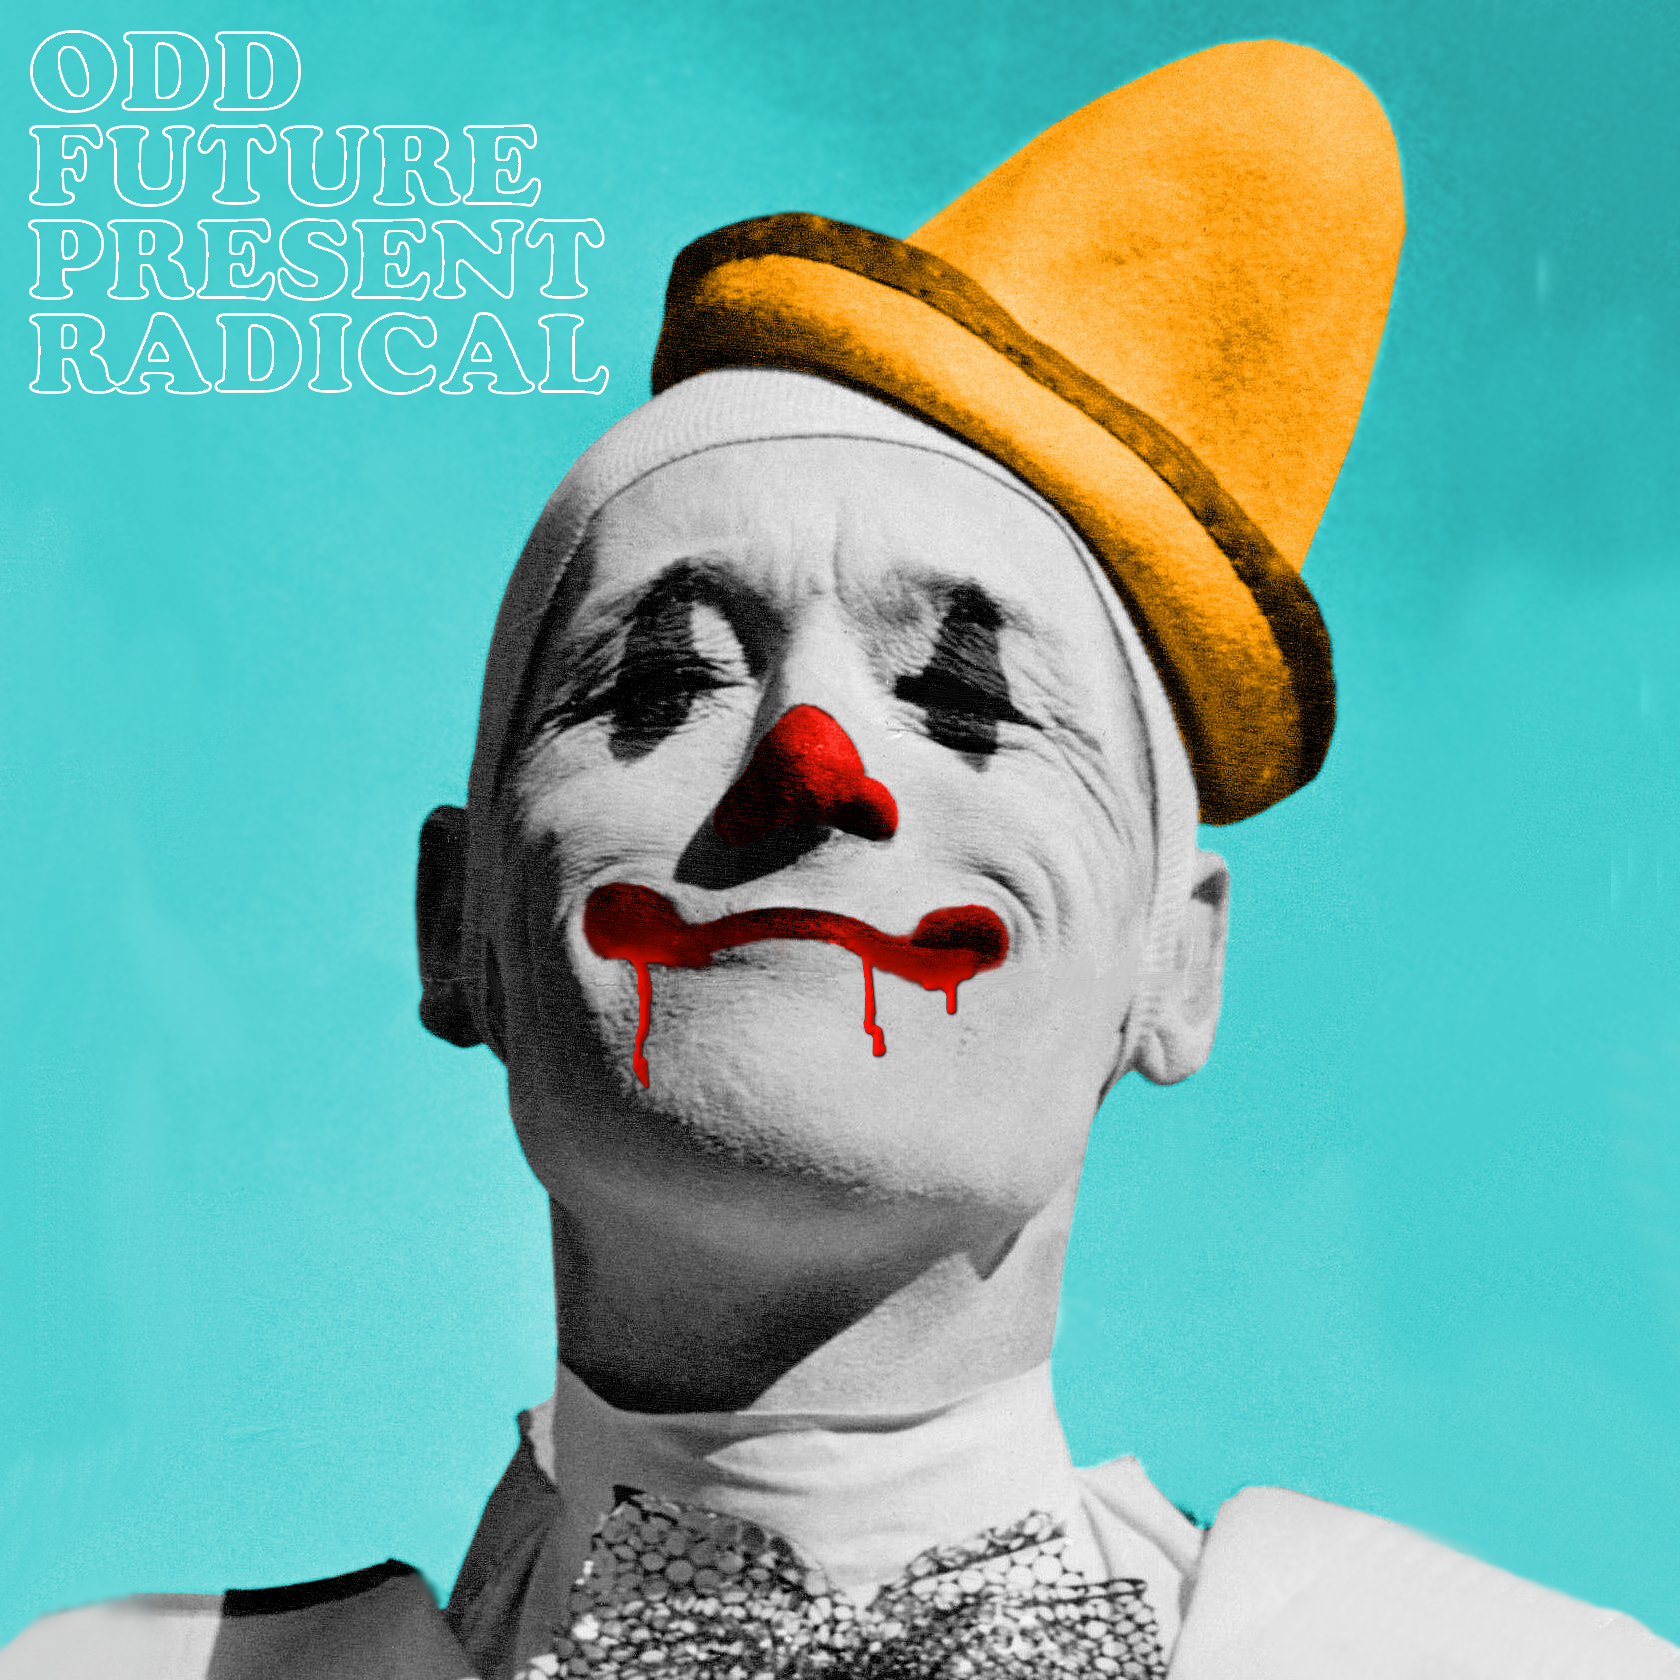 Odd Future Radical REMAKE 2 by PADYBUOdd Future Wallpaper Cross